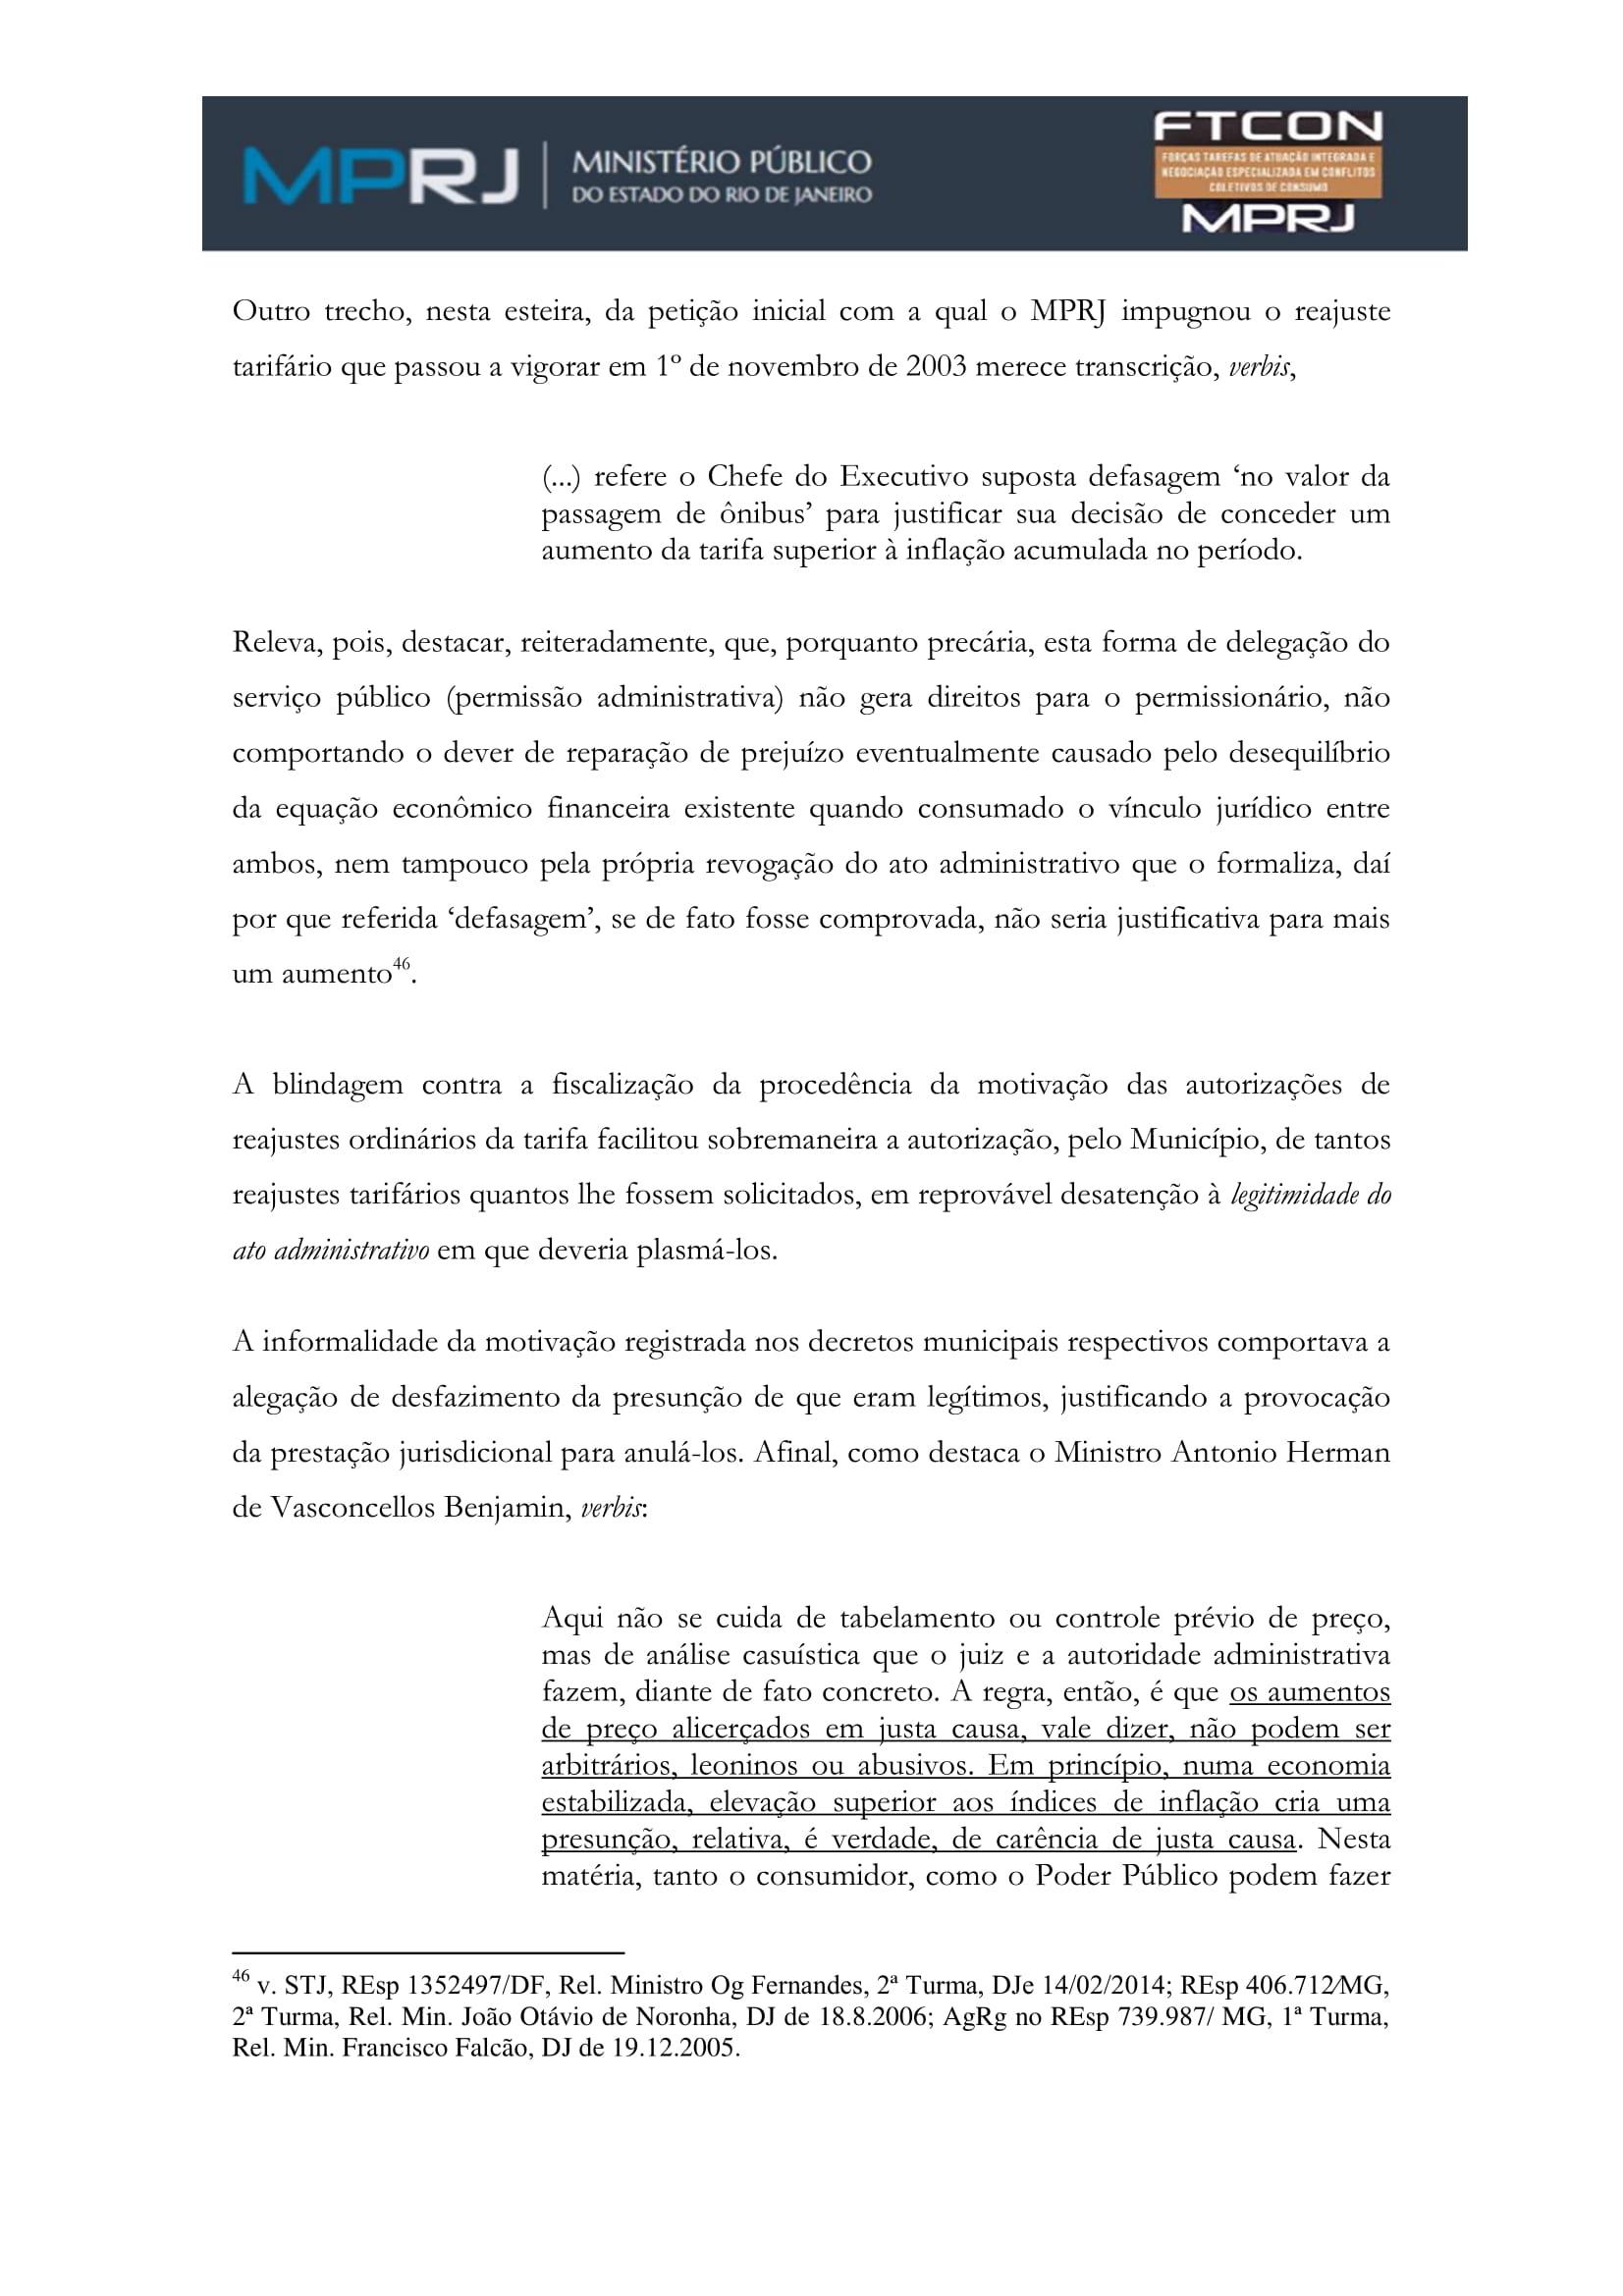 acp_caducidade_onibus_dr_rt-061